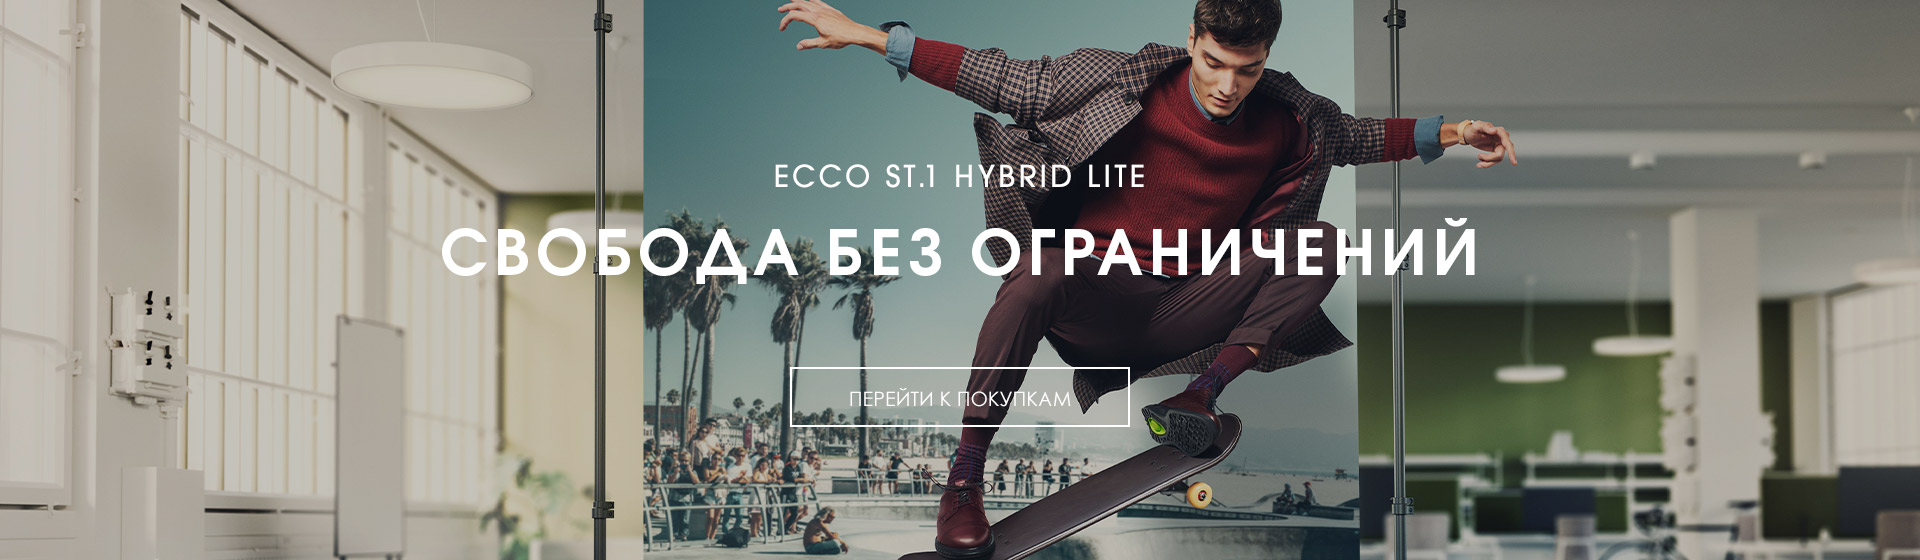 ECCO ST.1 HYBRID LITE